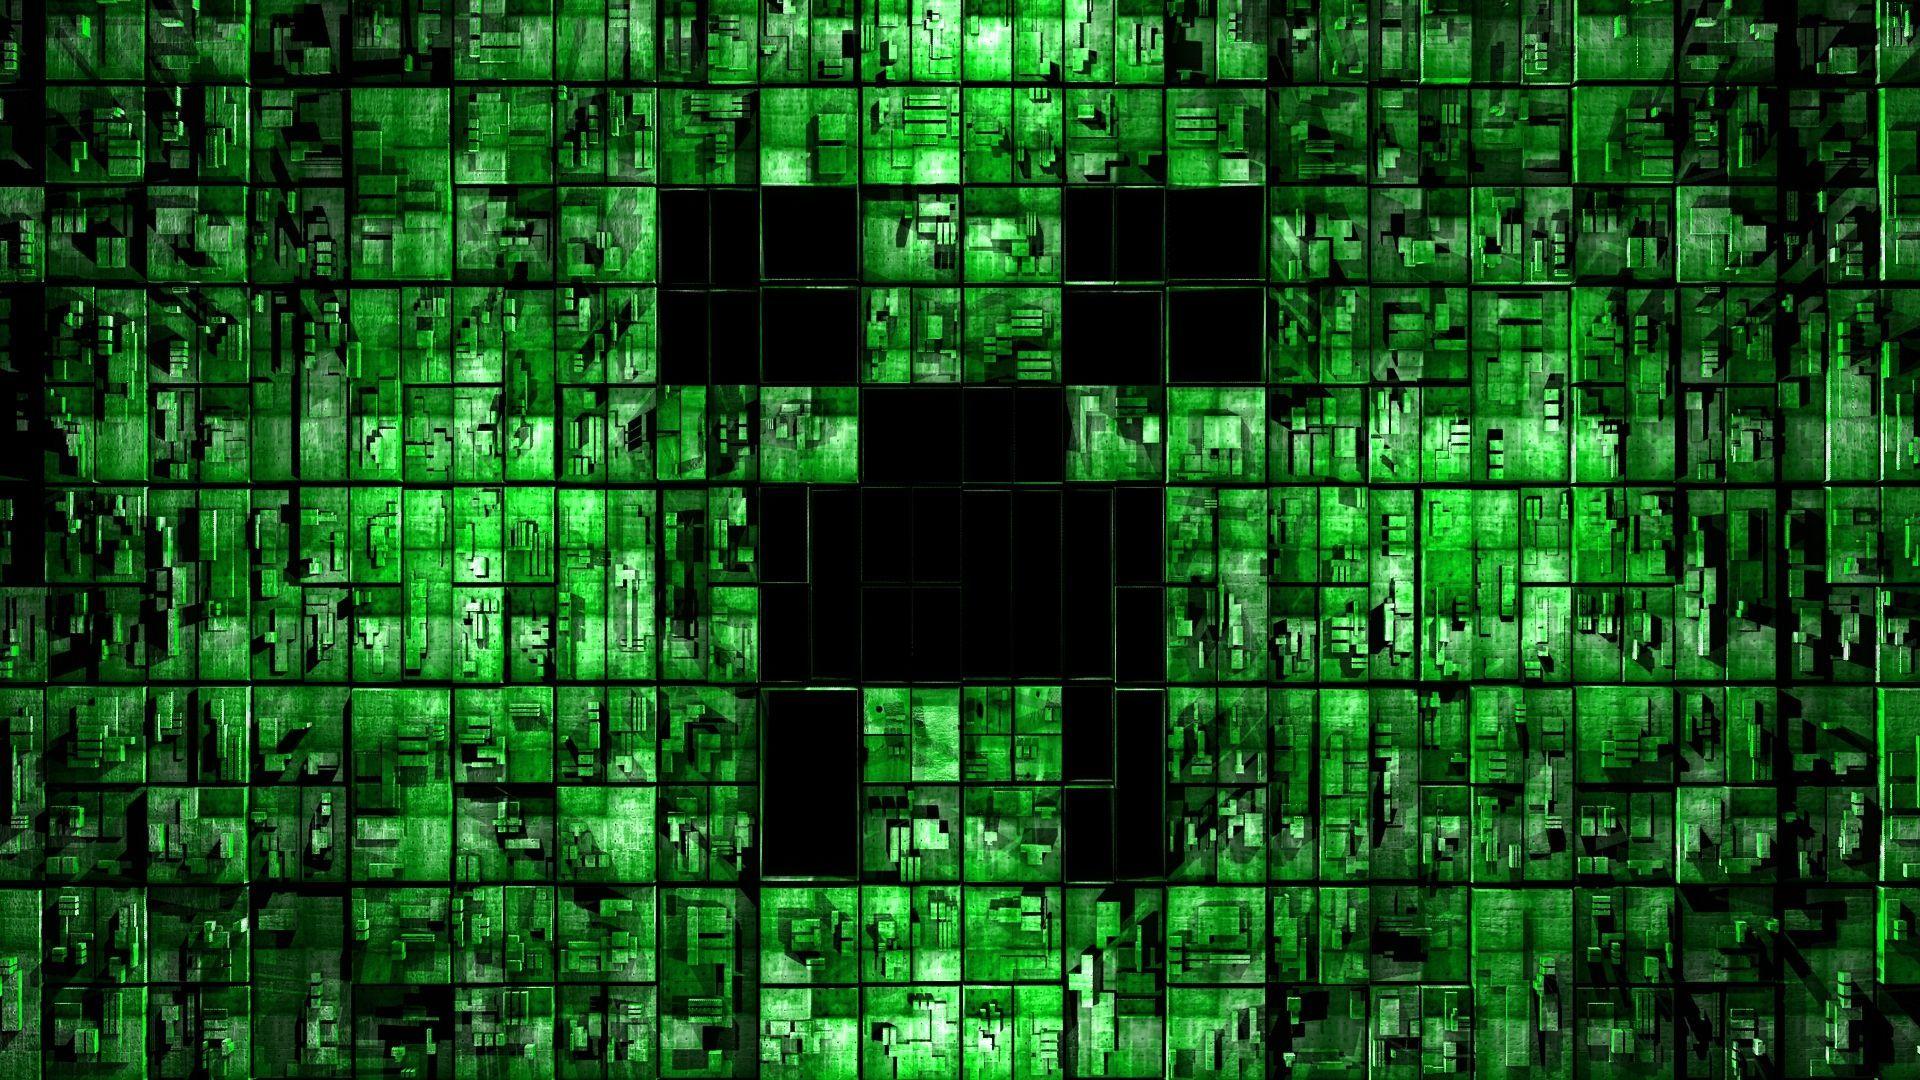 Minecraft Wallpapers Hd Hd Desktop Wallpapers Cool